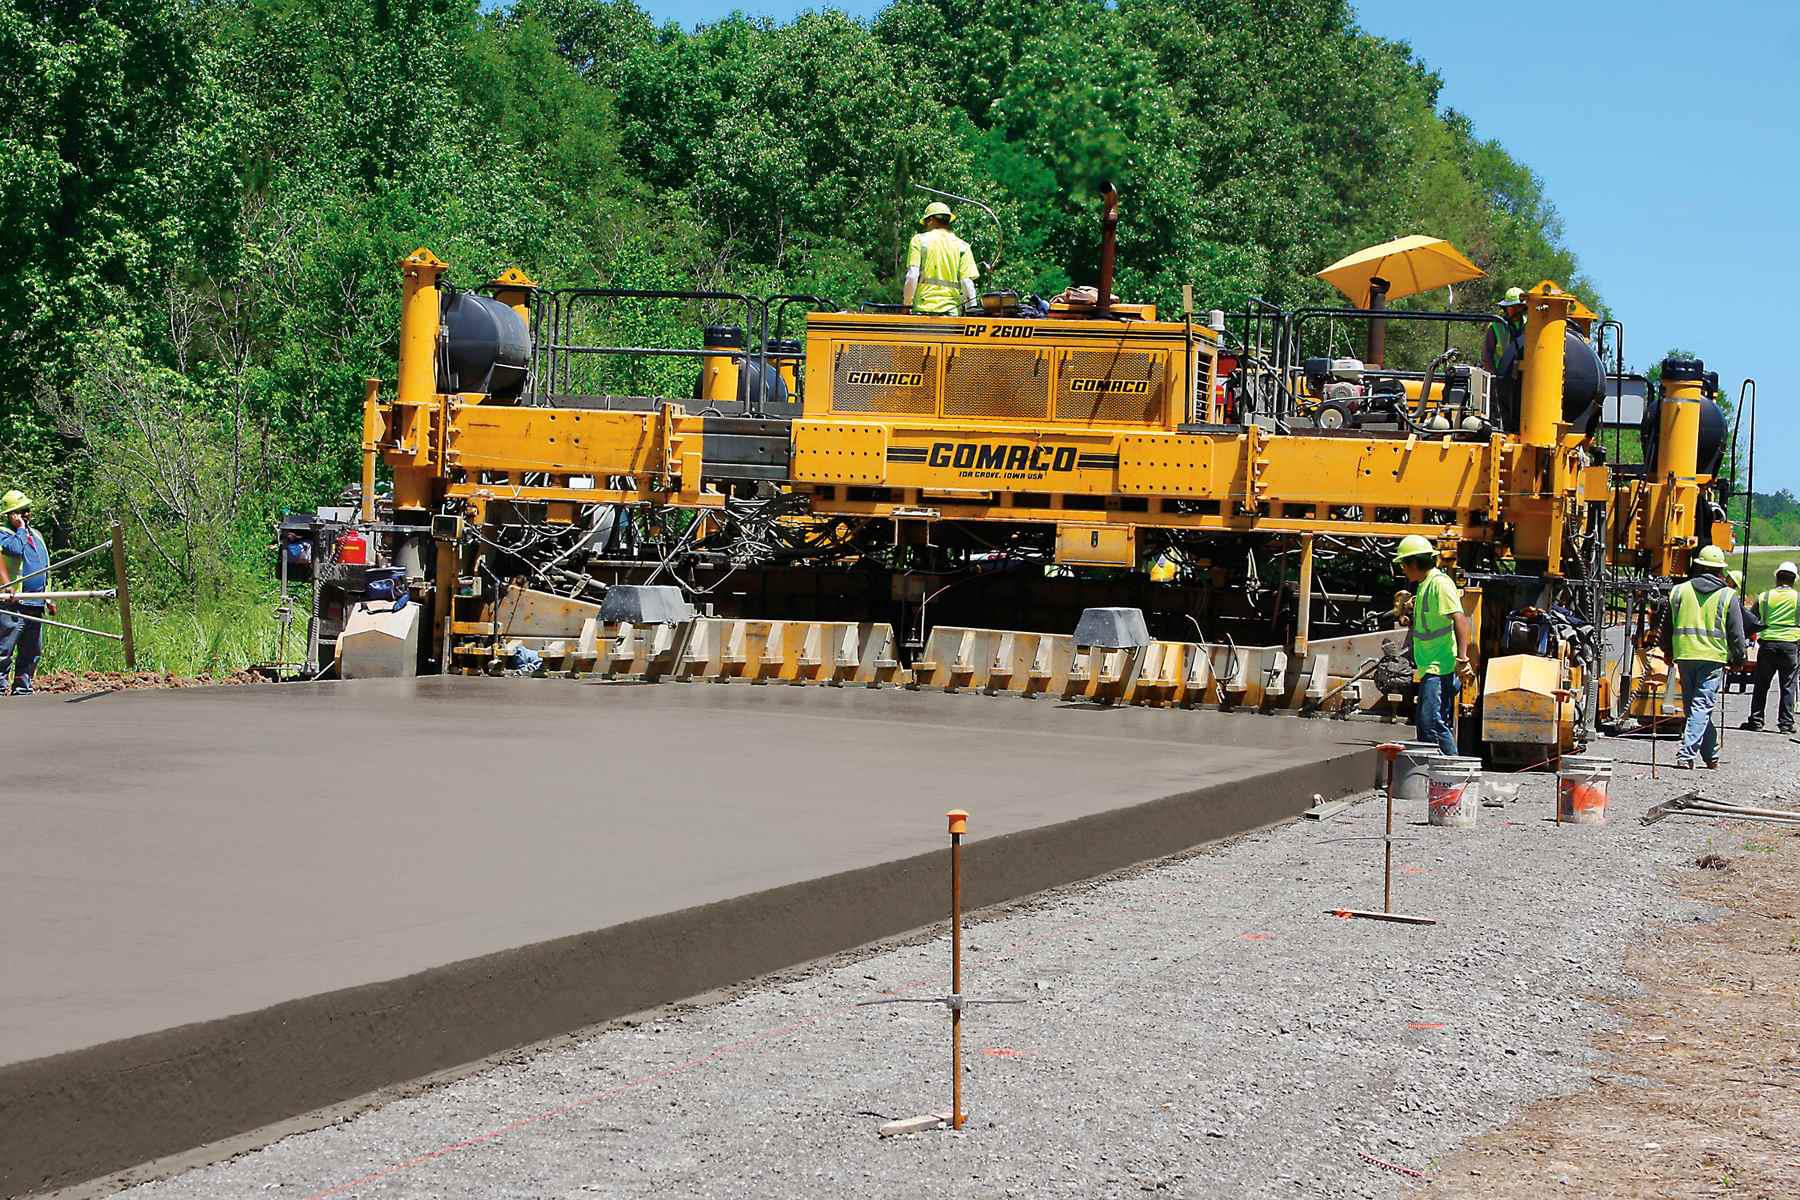 Concrete Paver Finisher : Slipform concrete pavers how to achieve bonus winning